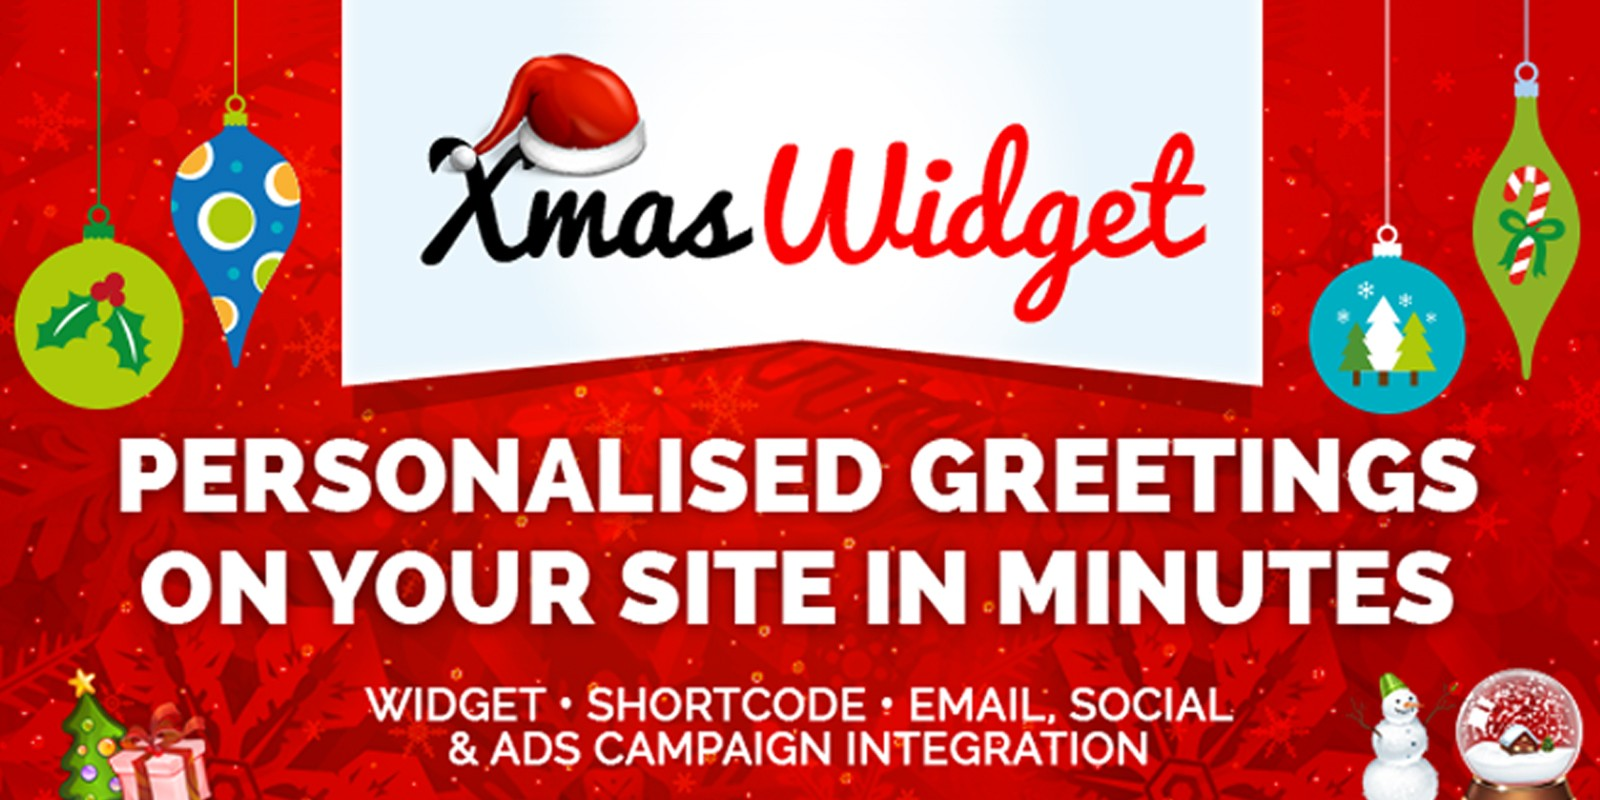 Xmas Widget - WordPress Plugin